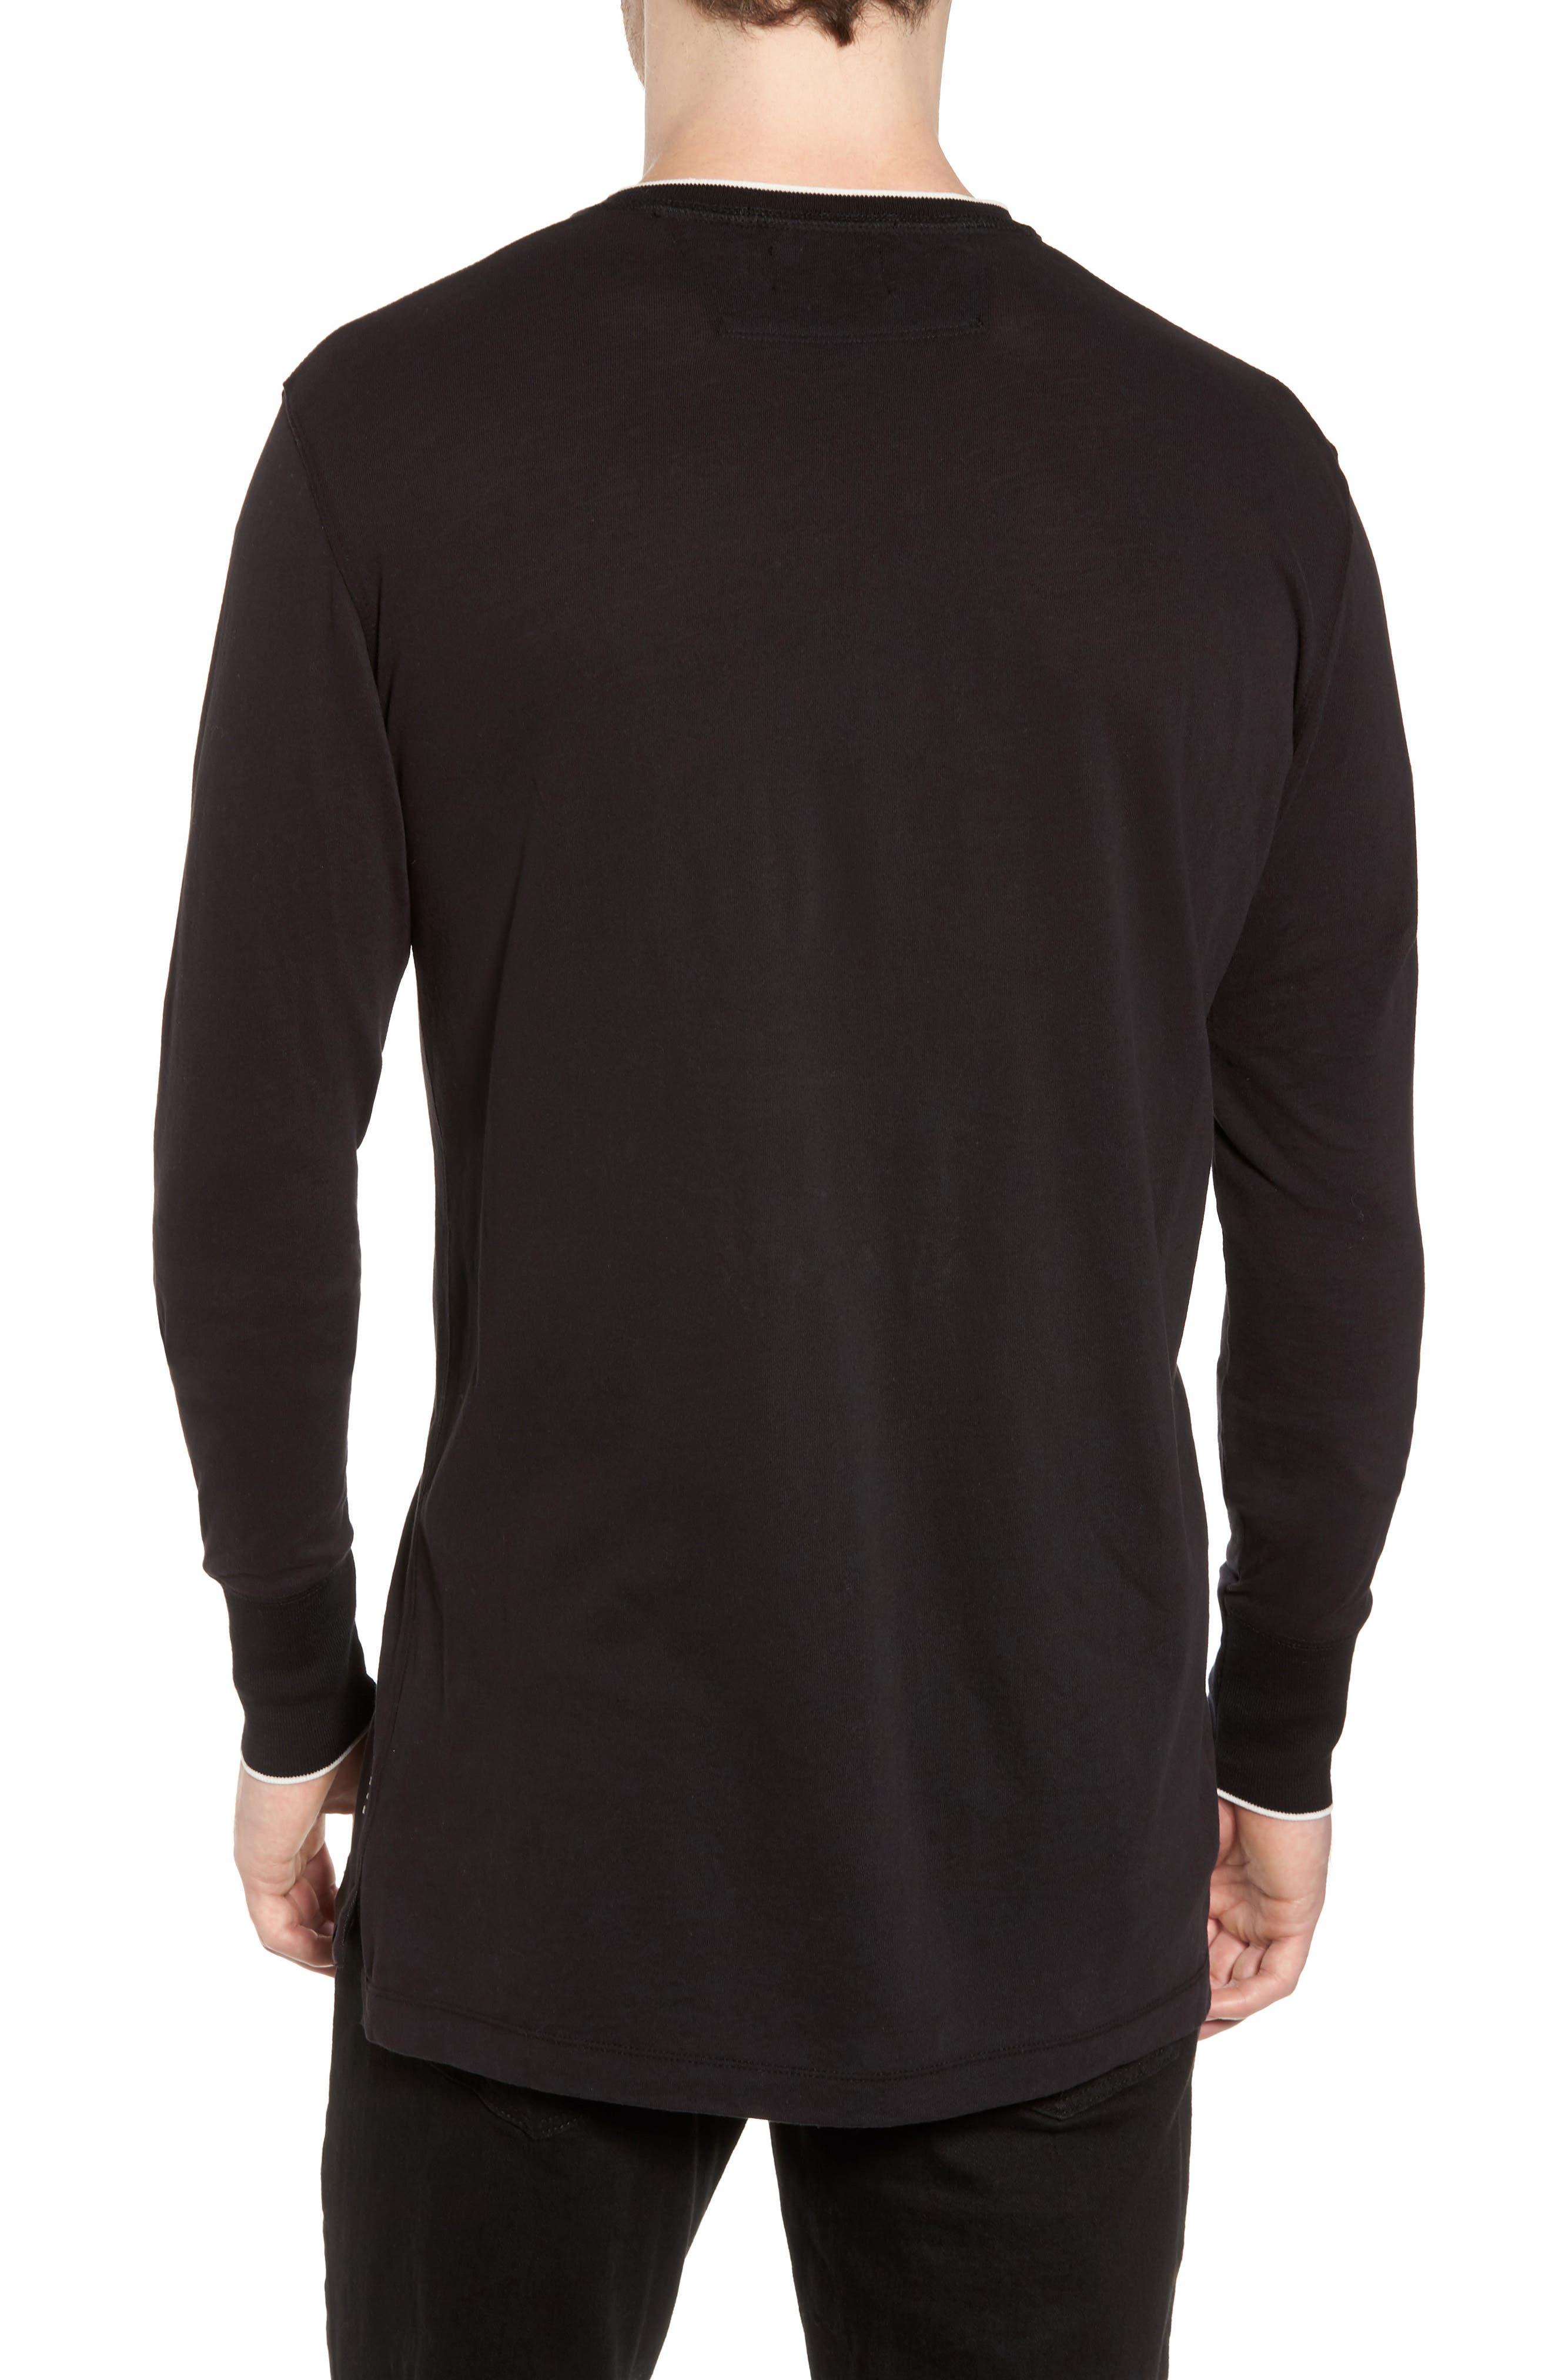 Club Nomade Soft Granddad T-Shirt,                             Alternate thumbnail 2, color,